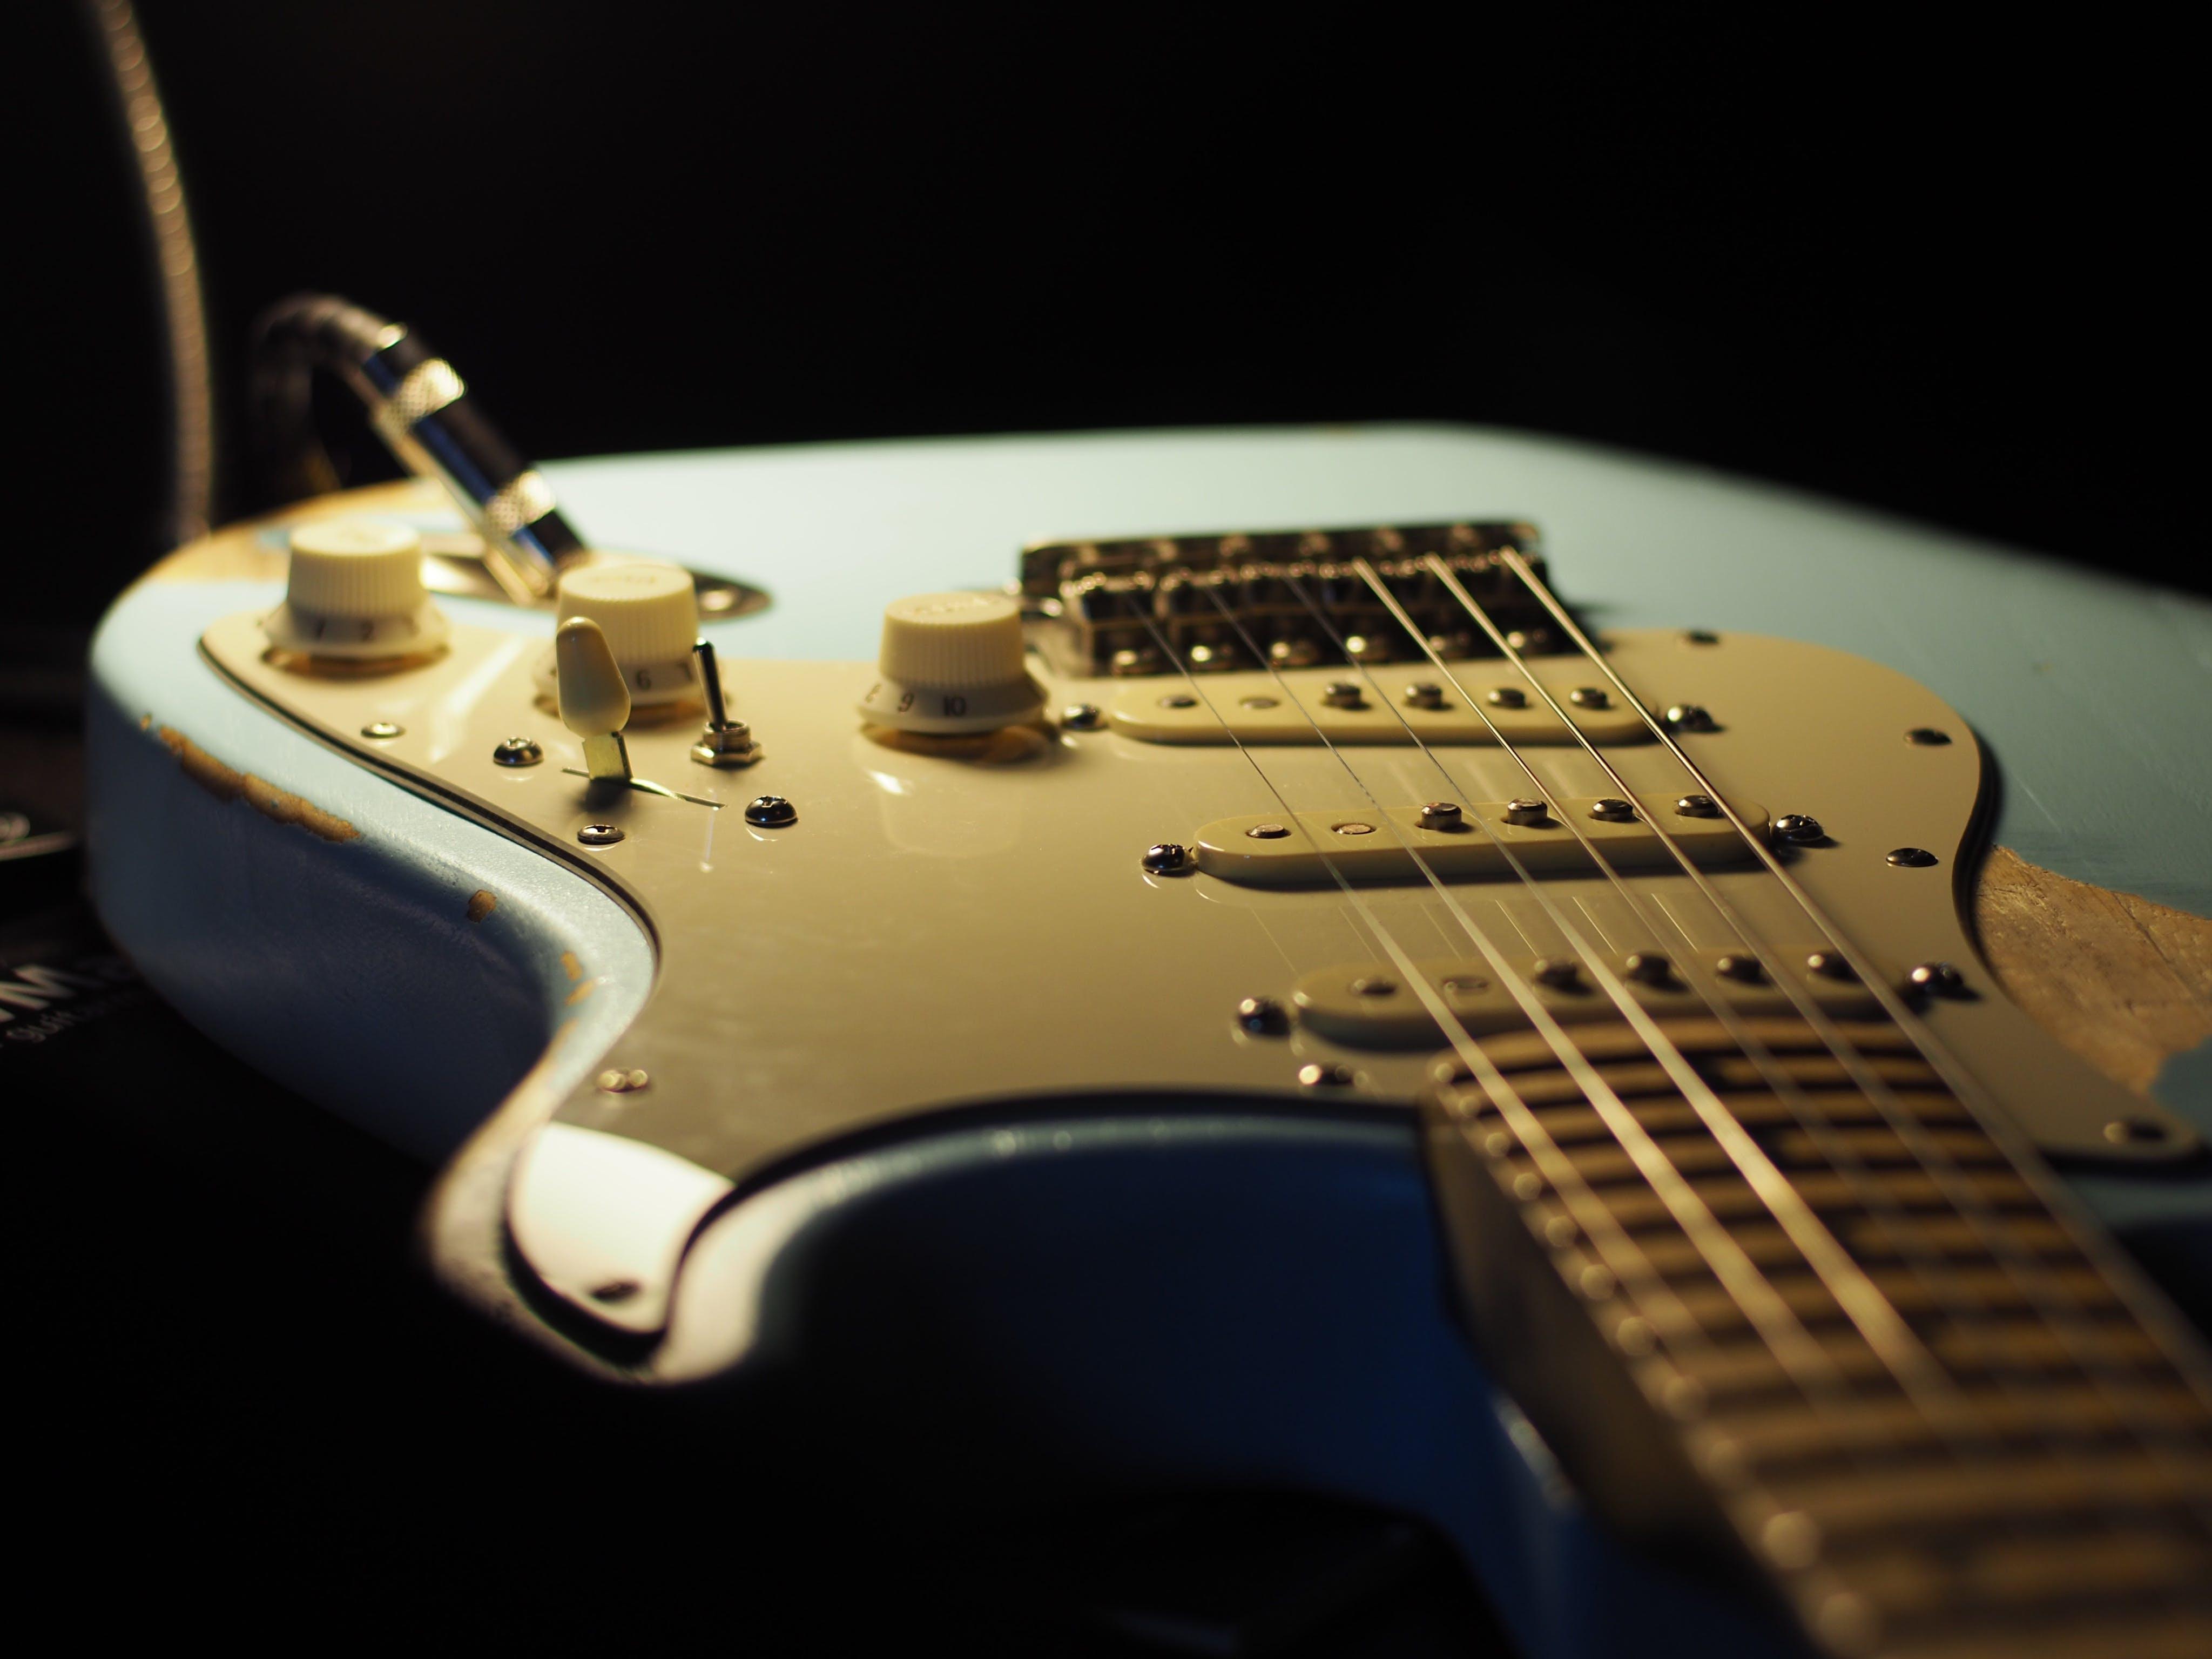 amp, blue, electric guitar